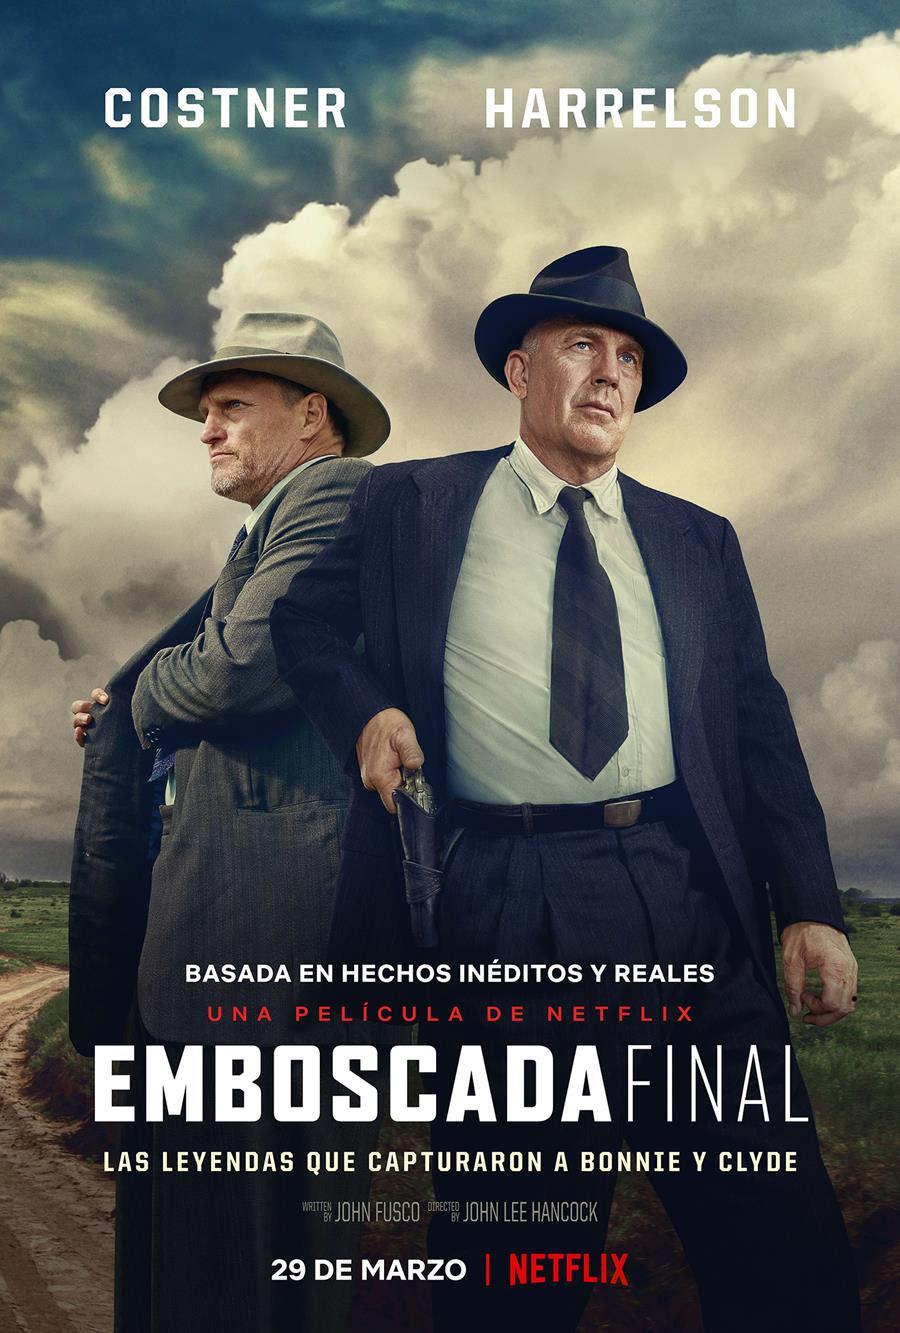 Emboscada Final Poster.jpg